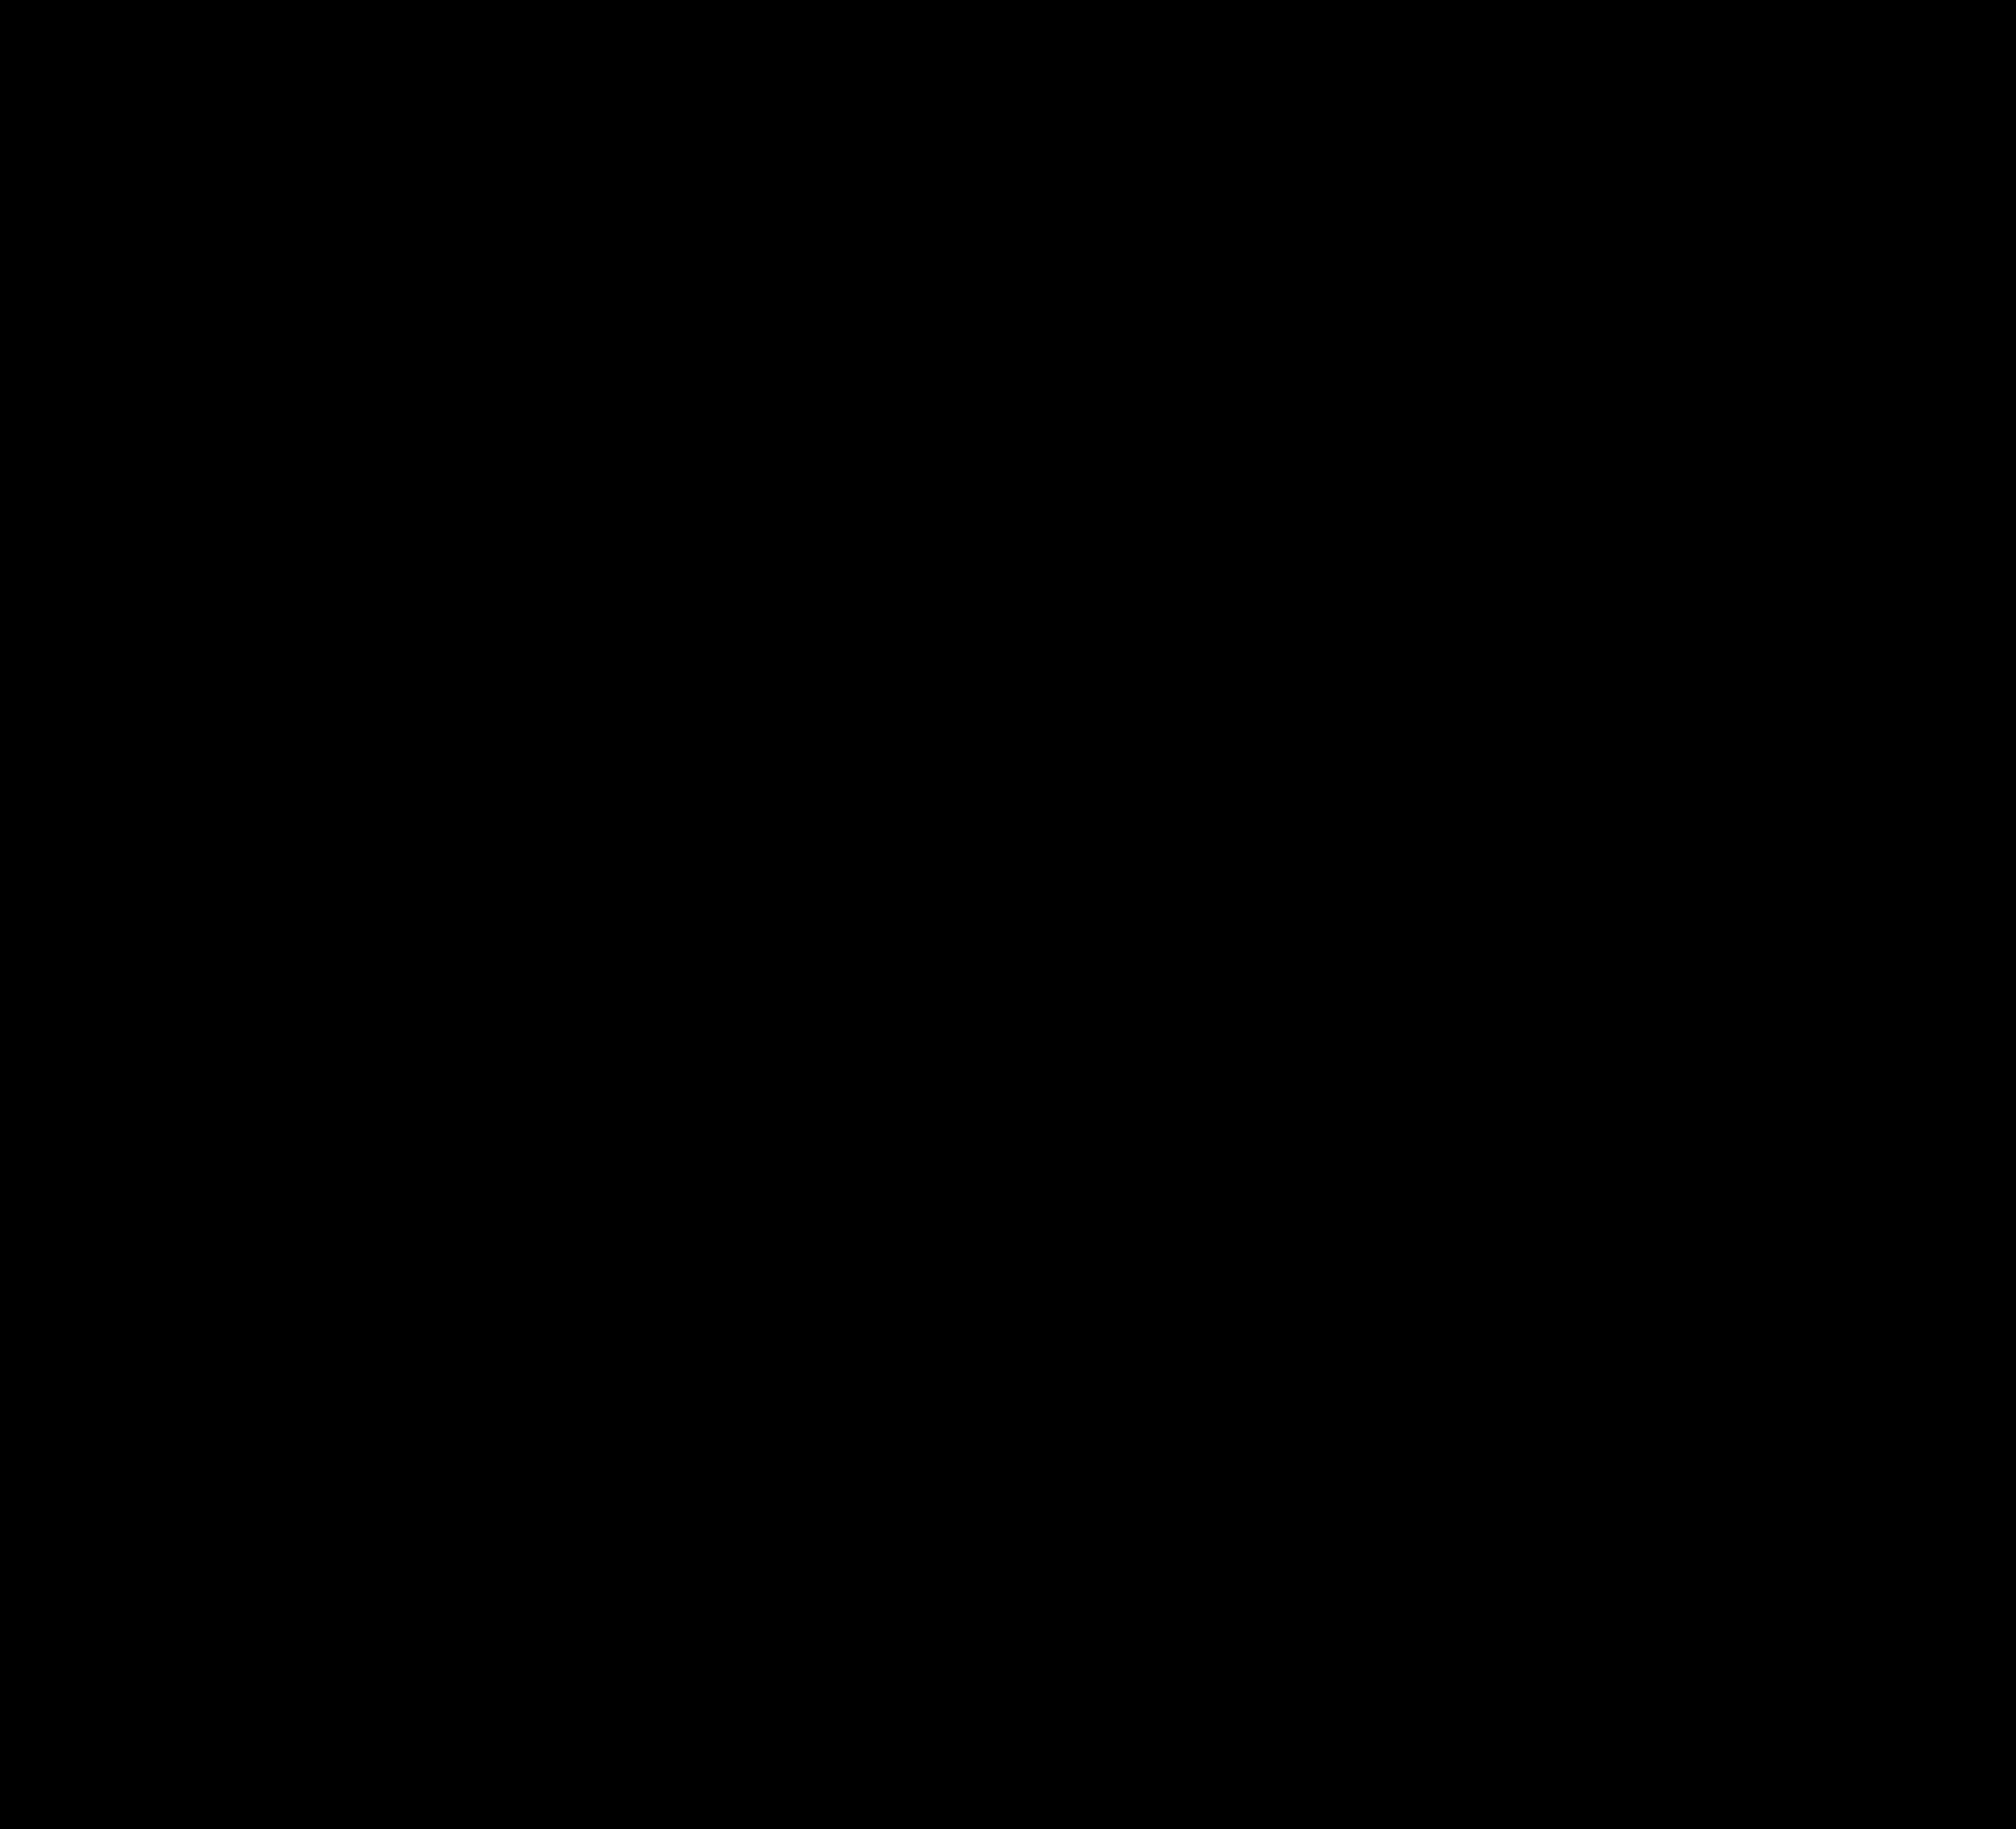 Skull PNG - 15802